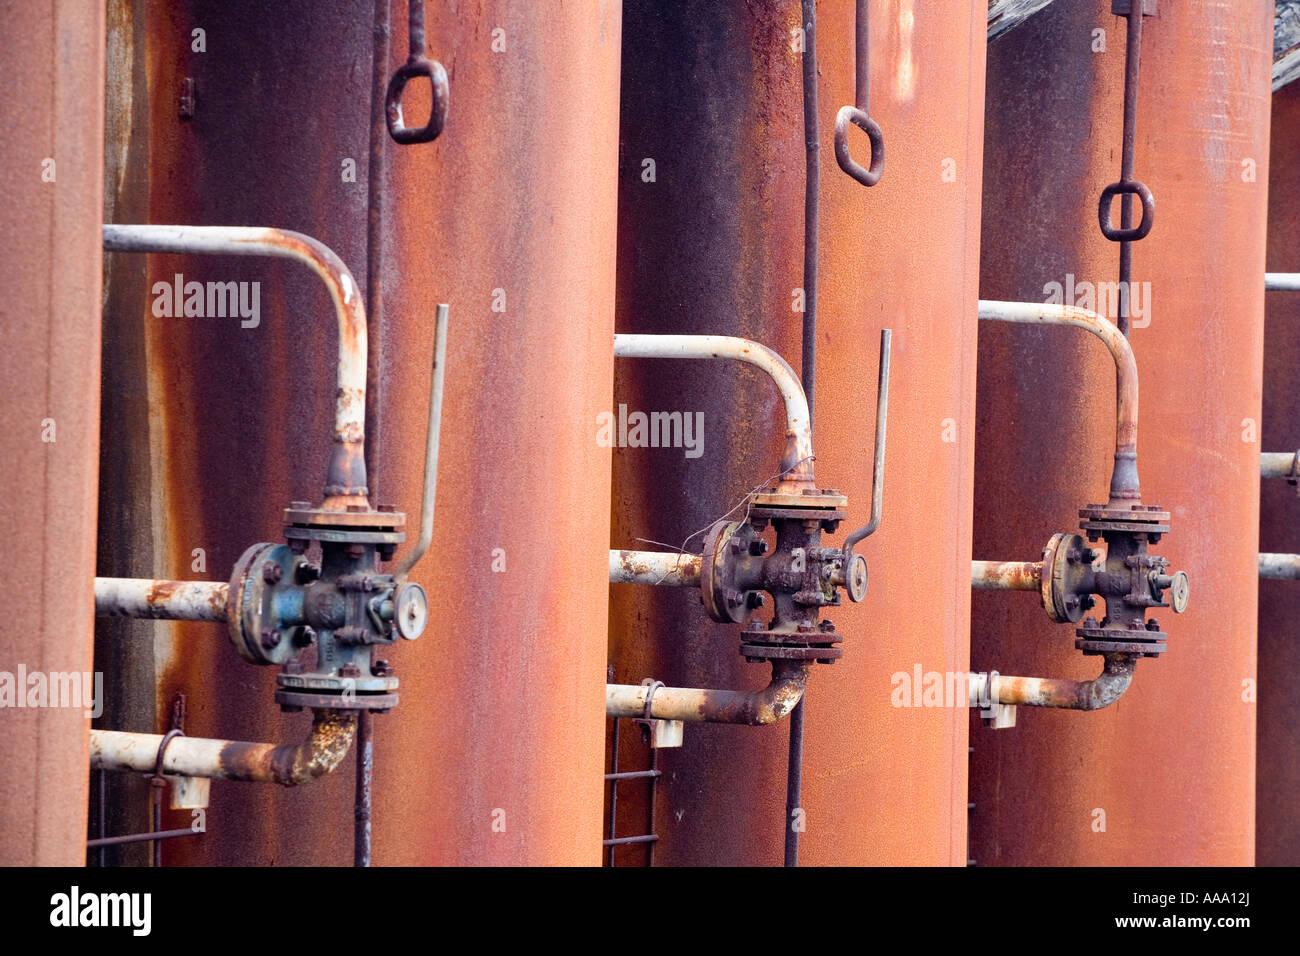 Kokerei Zollverein chimneys of coking plant - Stock Image